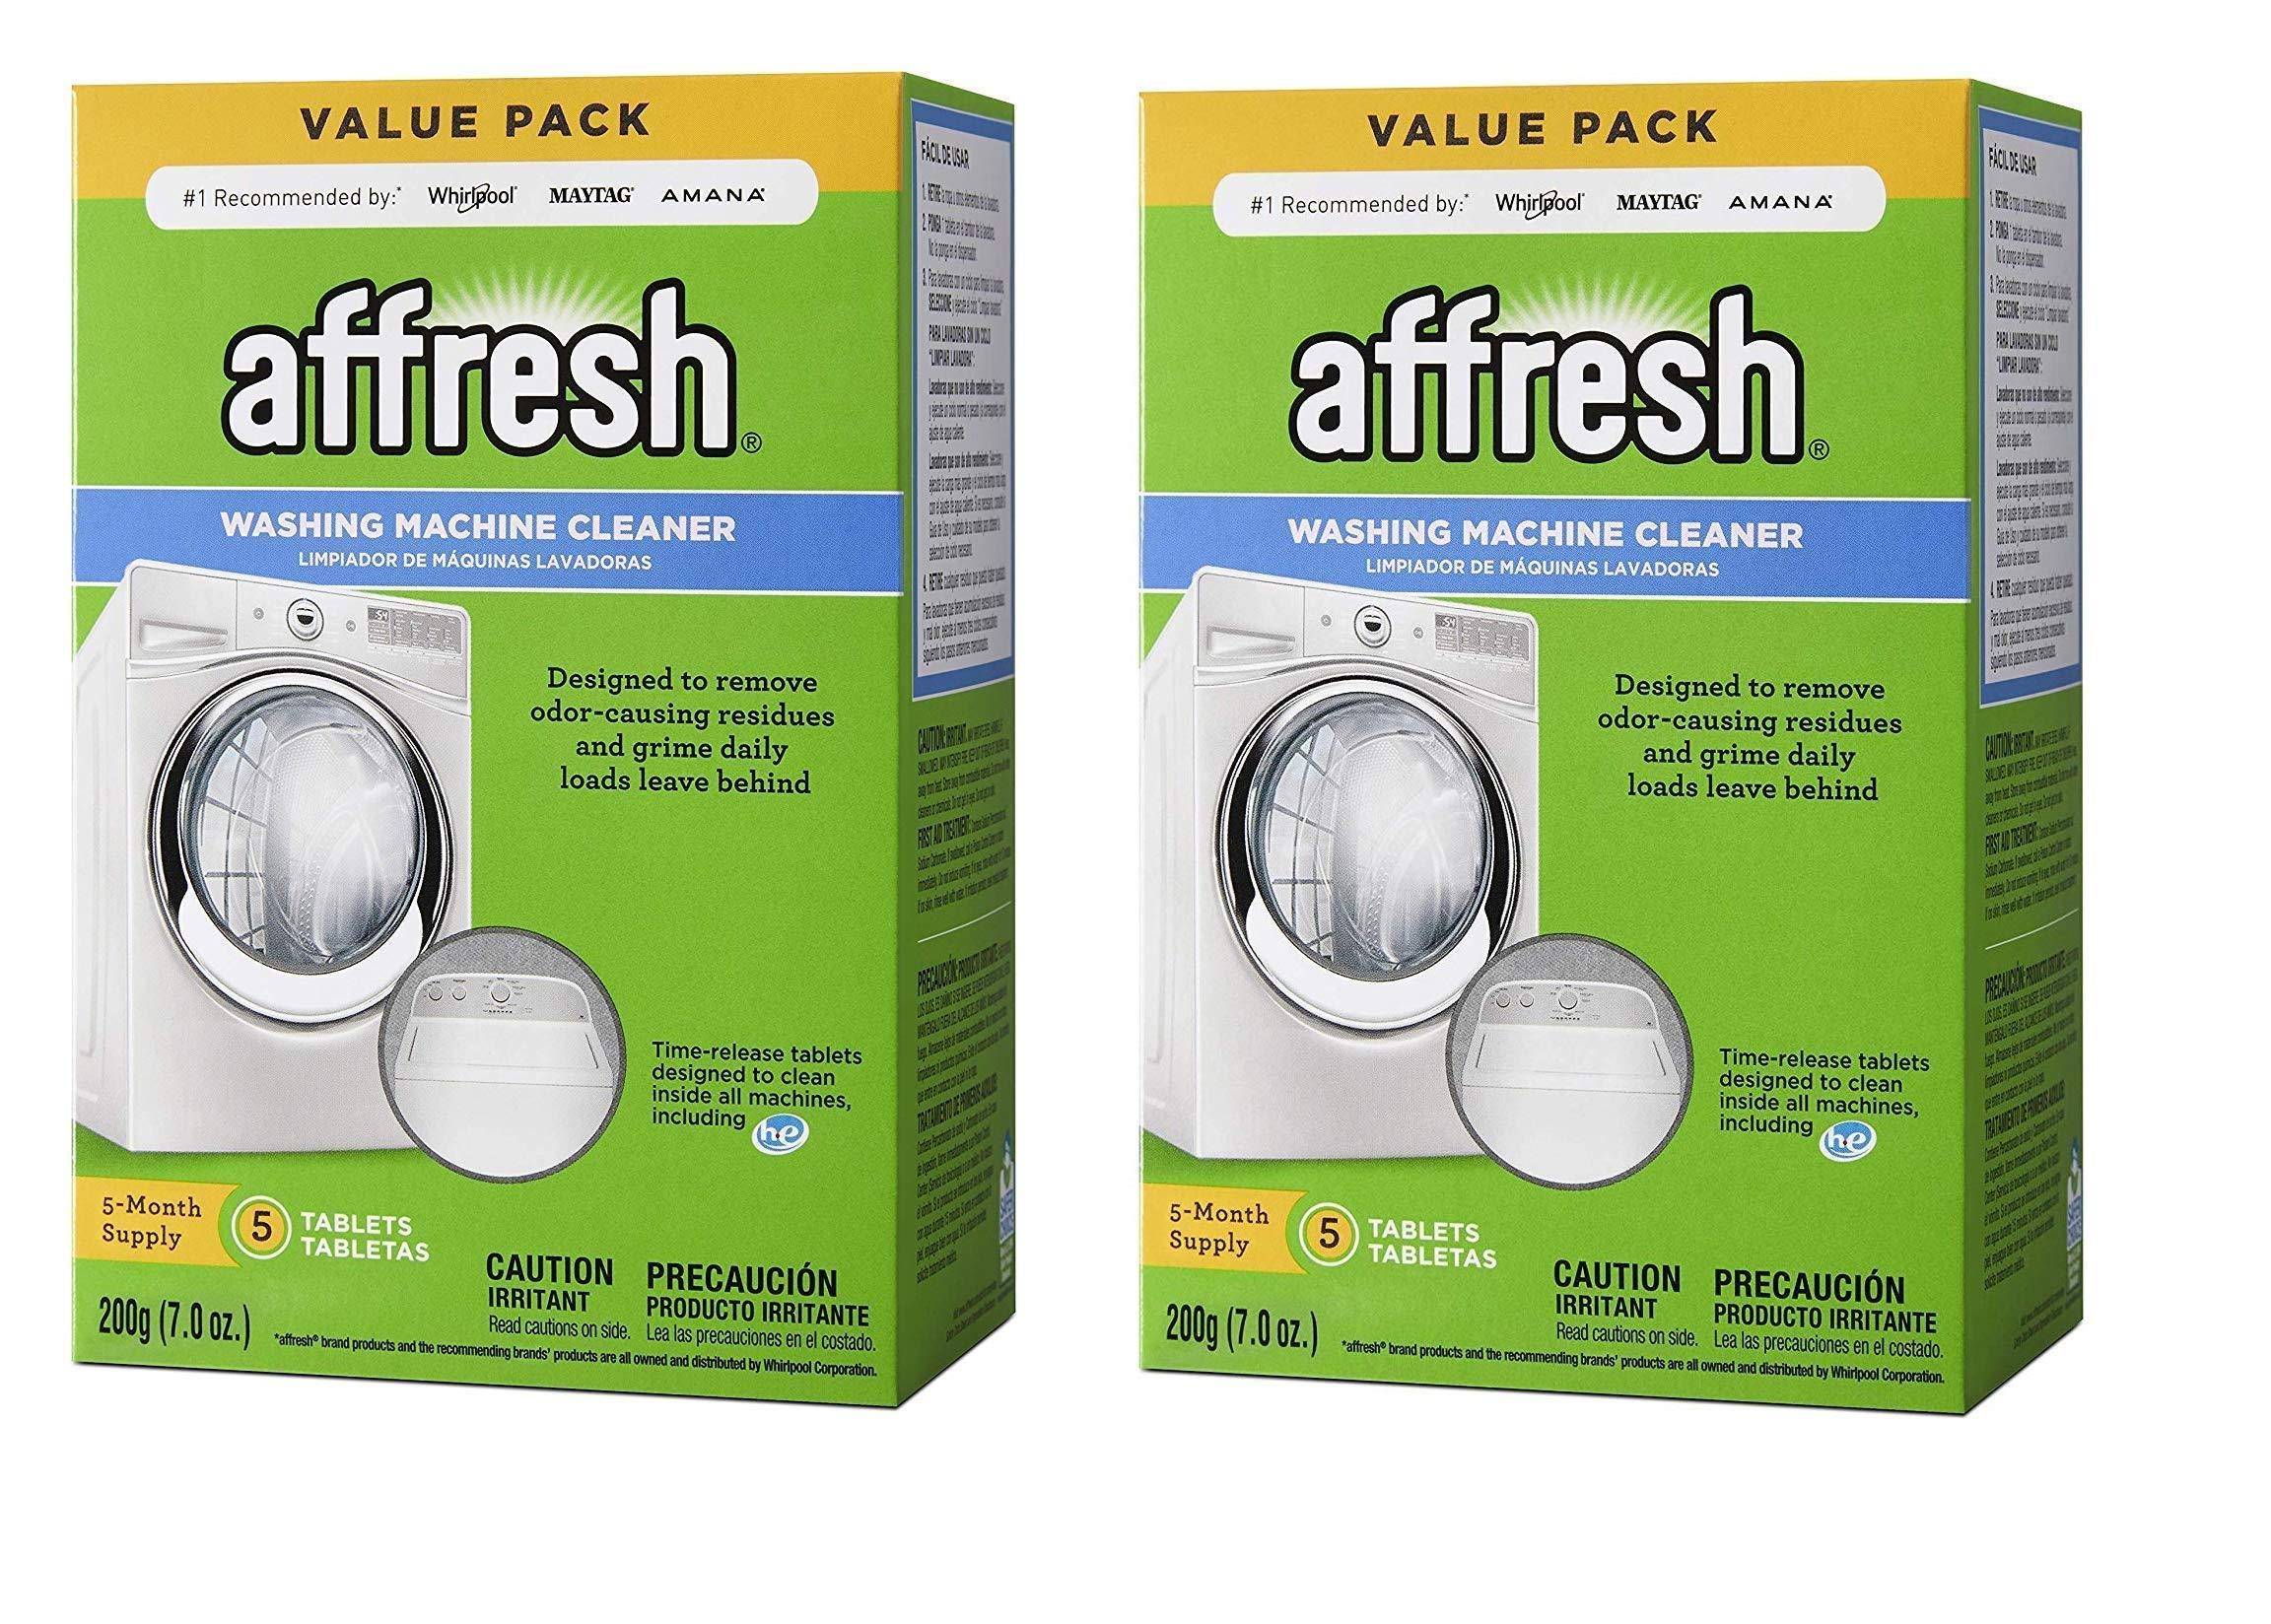 Affresh W10549846 Washer Cleaner 2 Pack